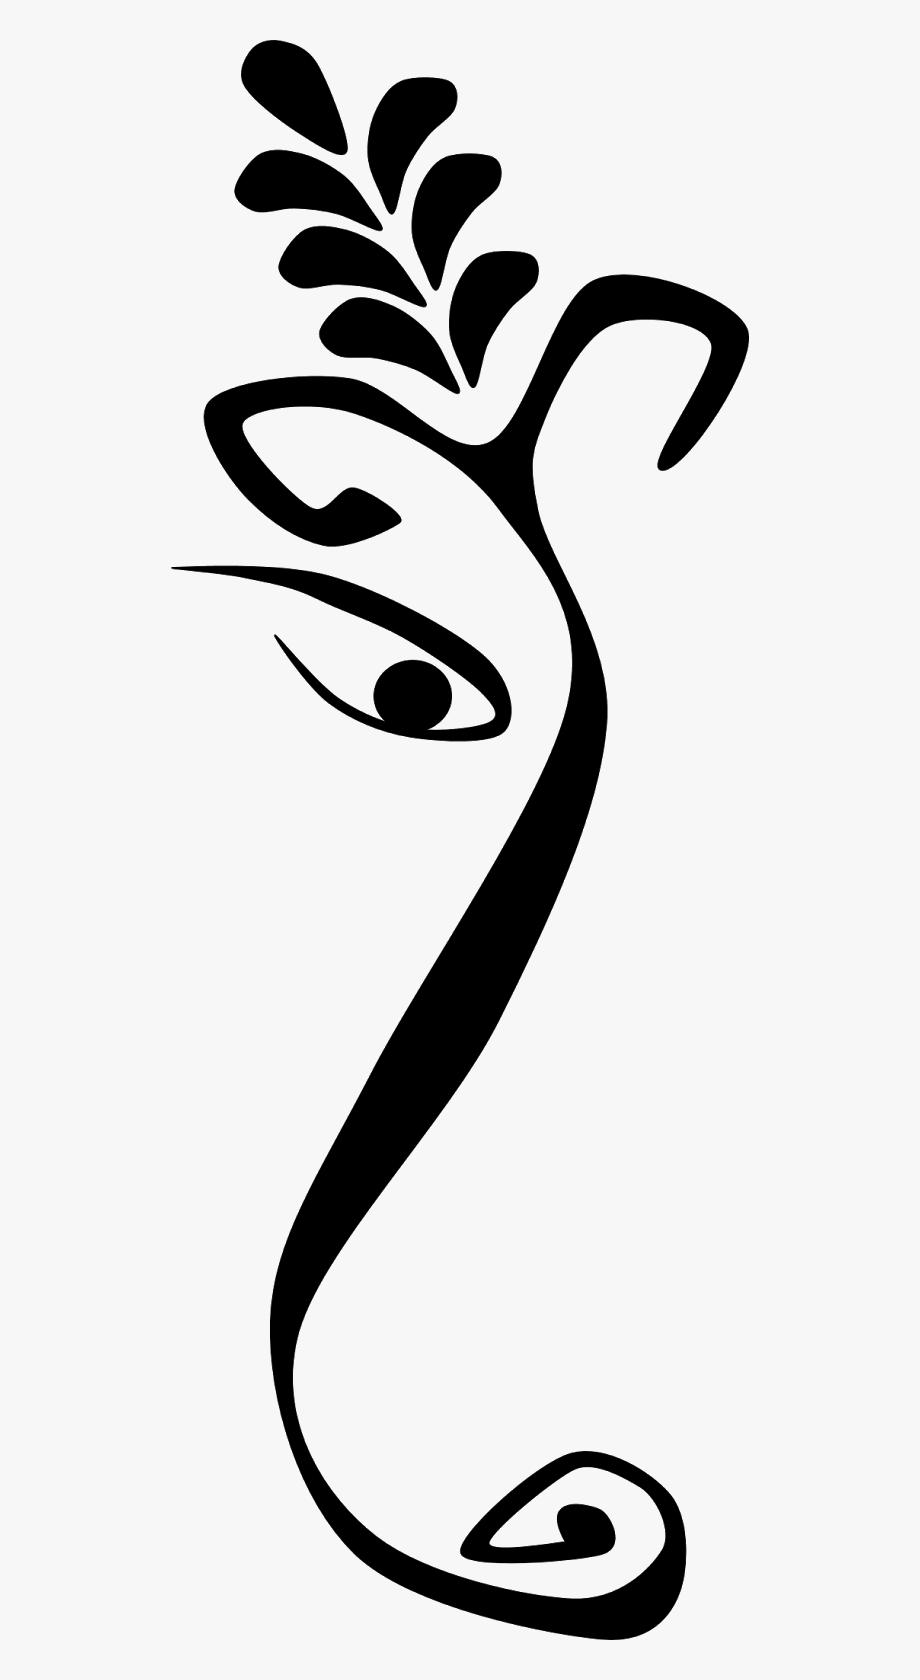 Ganpati clipart file banner Ganpati Clipart Image3 - Ganesh Clip Art Black And White #2507751 ... banner